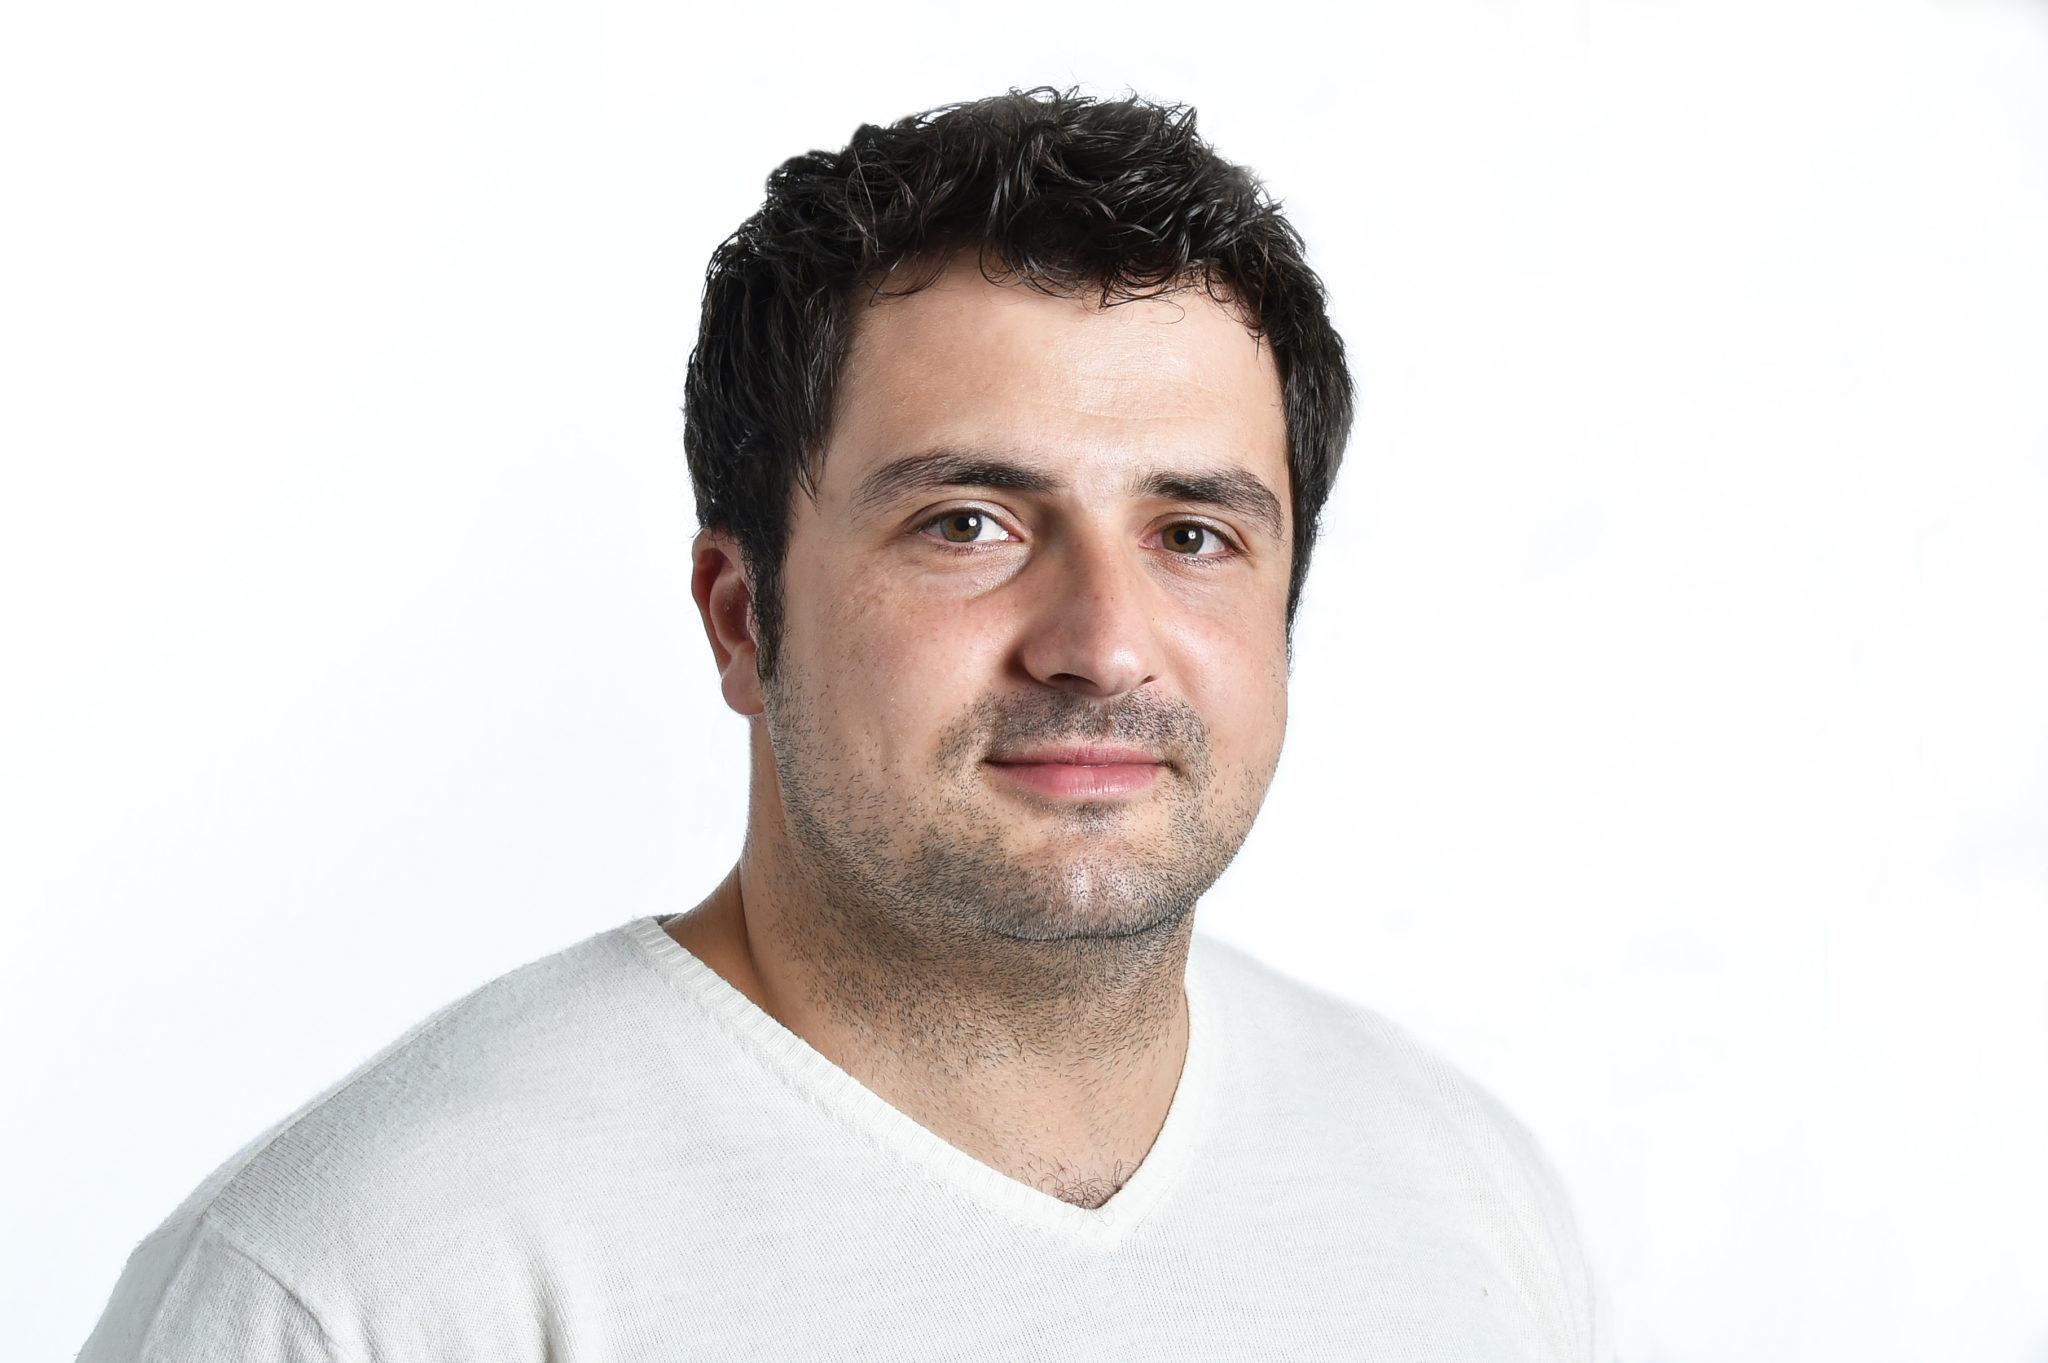 Mihail Ciobanu